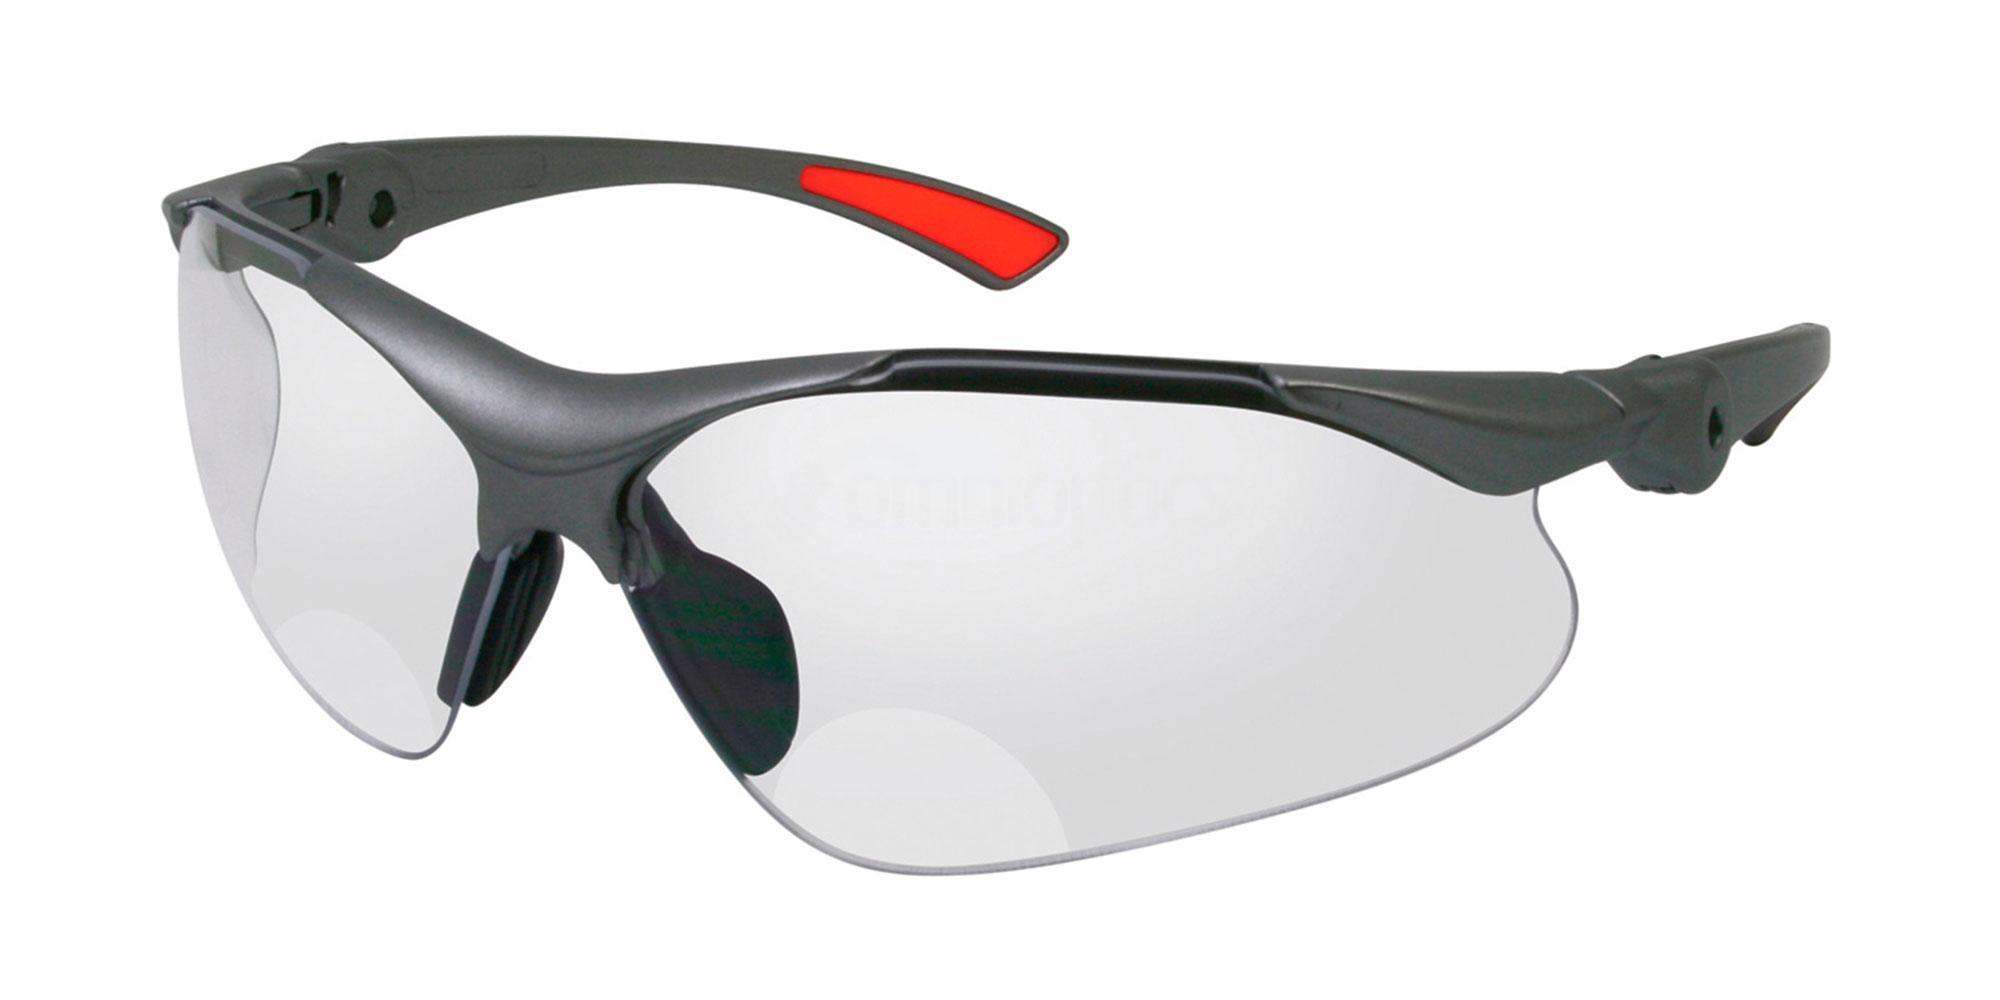 +1.50 Power Silver Grey/Orange SJ1203 Accessories, Sports Eyewear